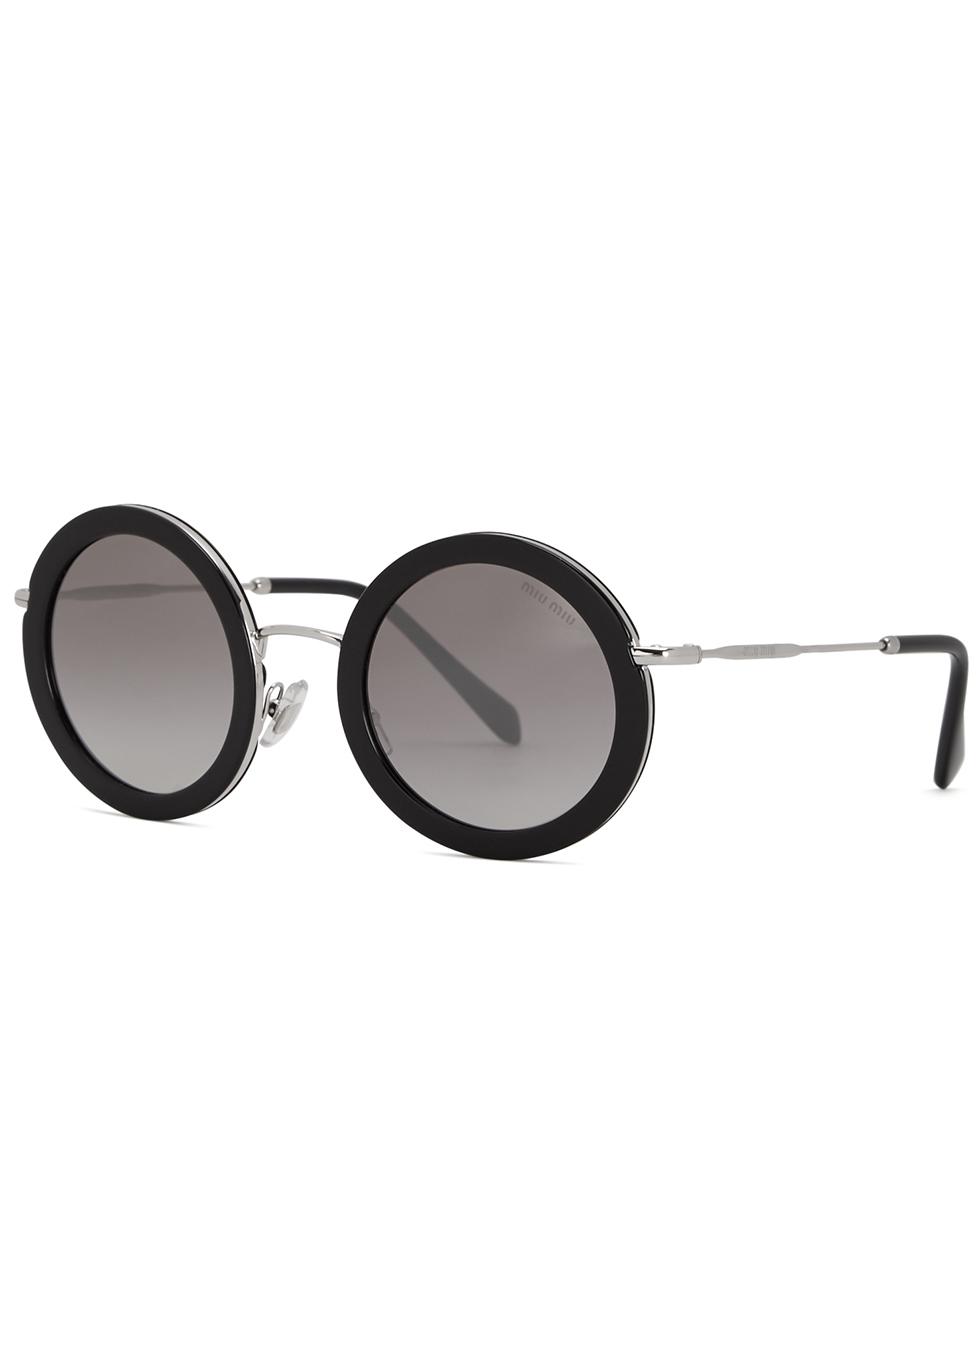 4de9e3cca8e Women s Designer Sunglasses and Eyewear - Harvey Nichols